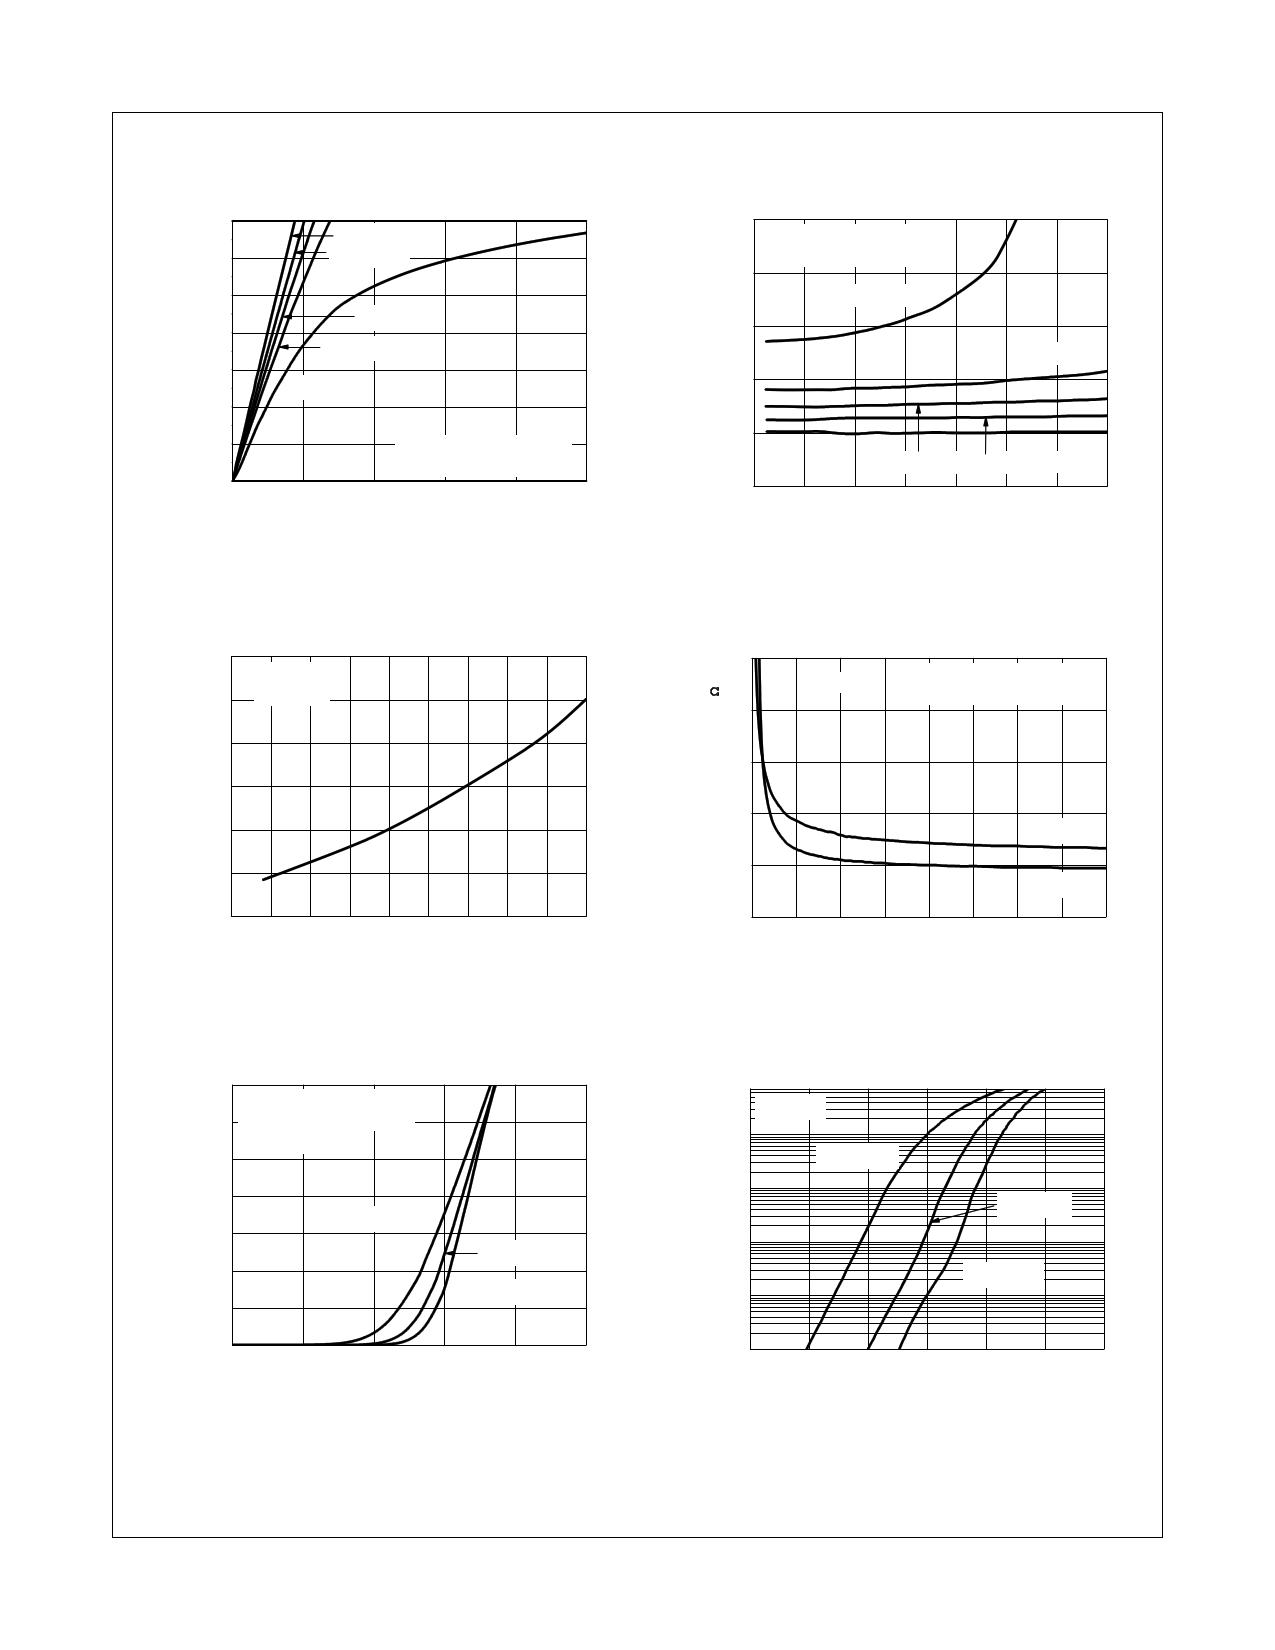 FDMS3620S pdf, 반도체, 판매, 대치품